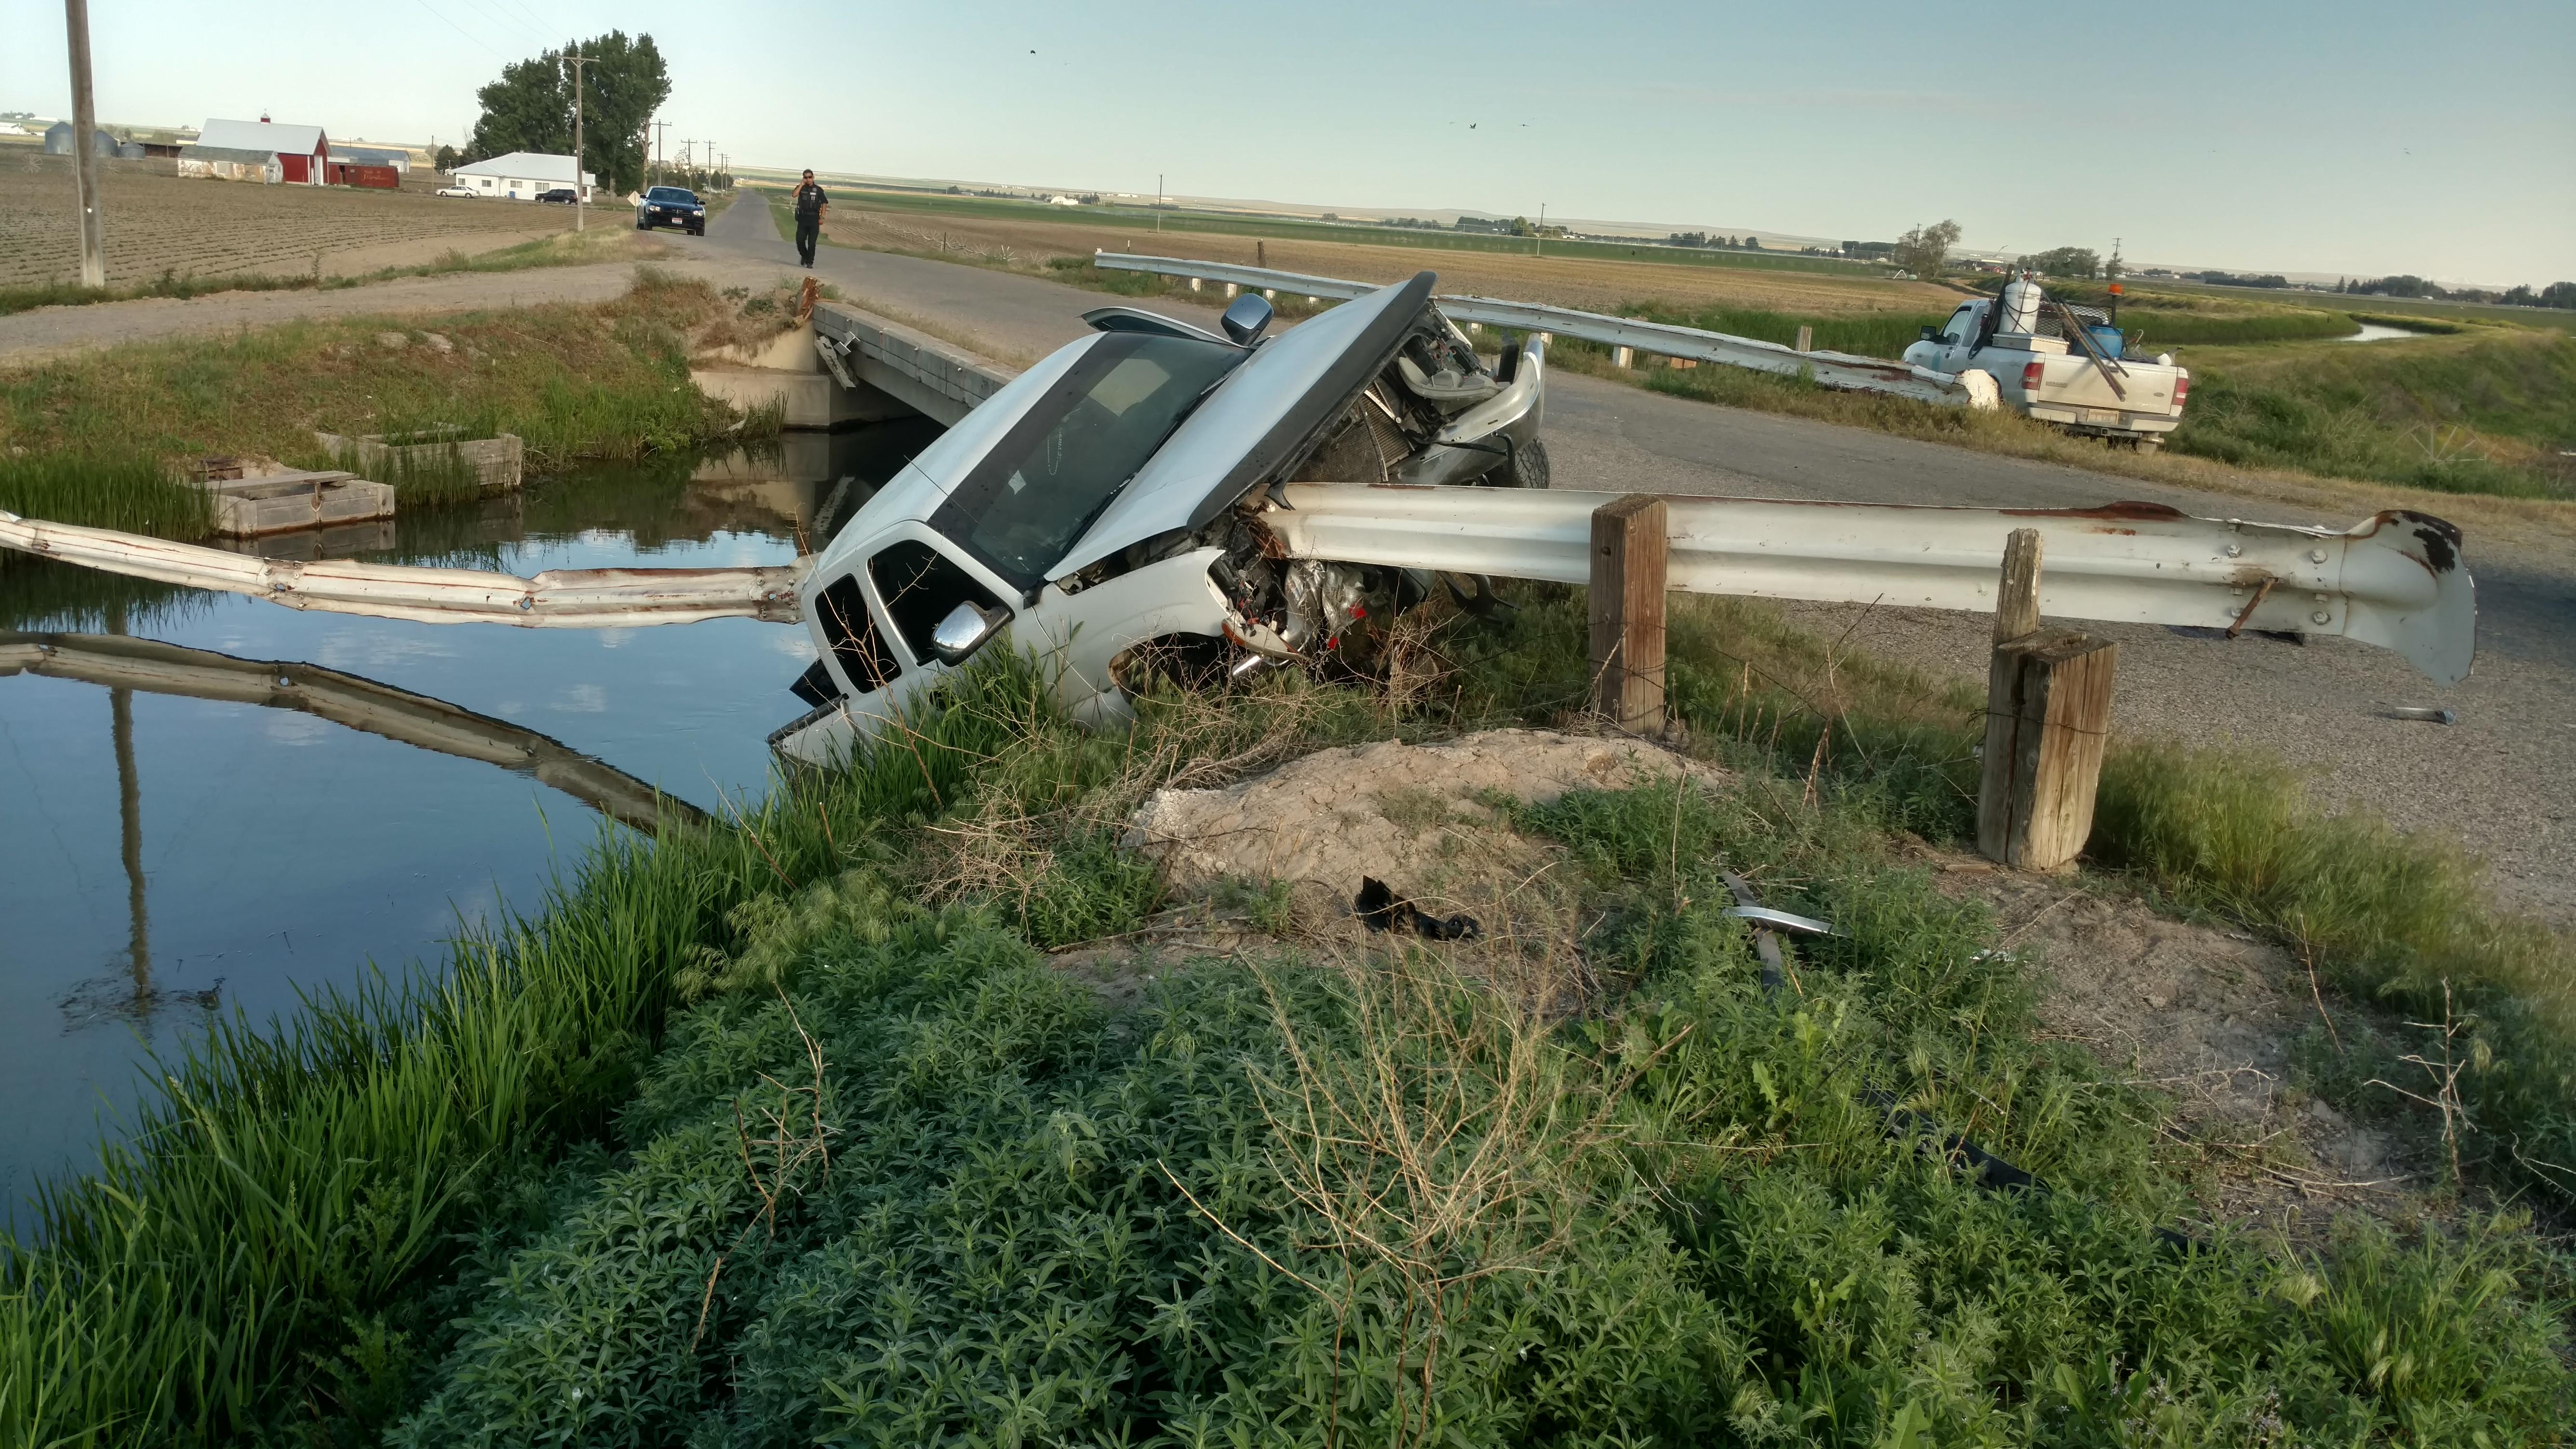 Stolen pickup found impaled on 30 feet of steel guard rail